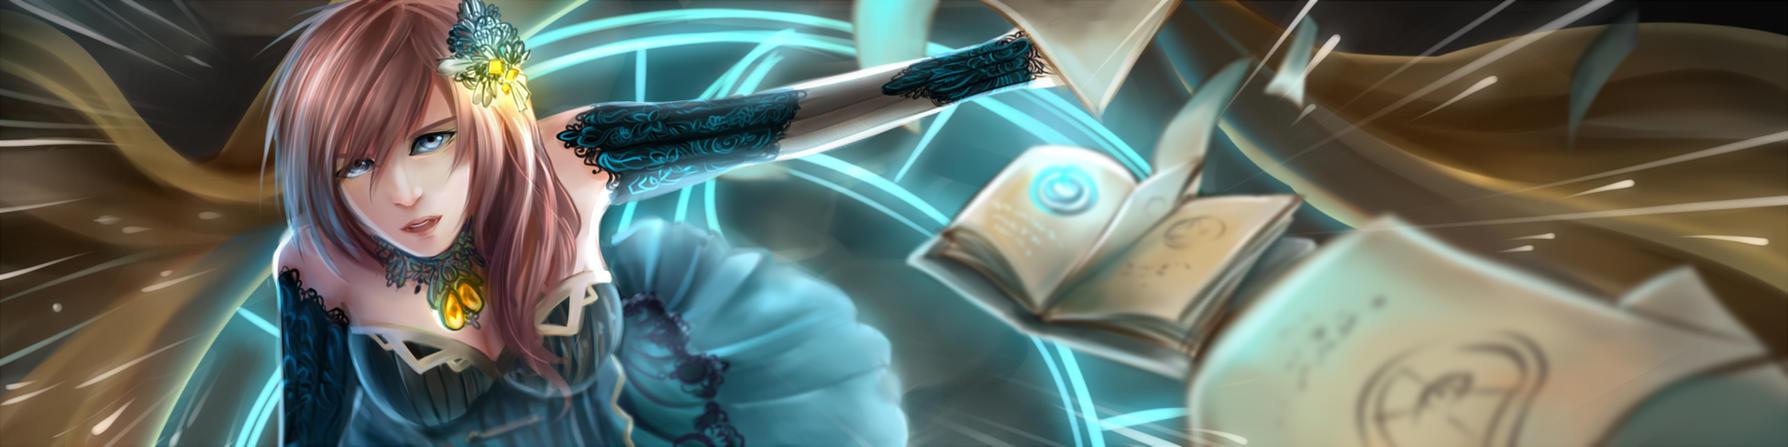 Blue Sorcerer by nheinnahn